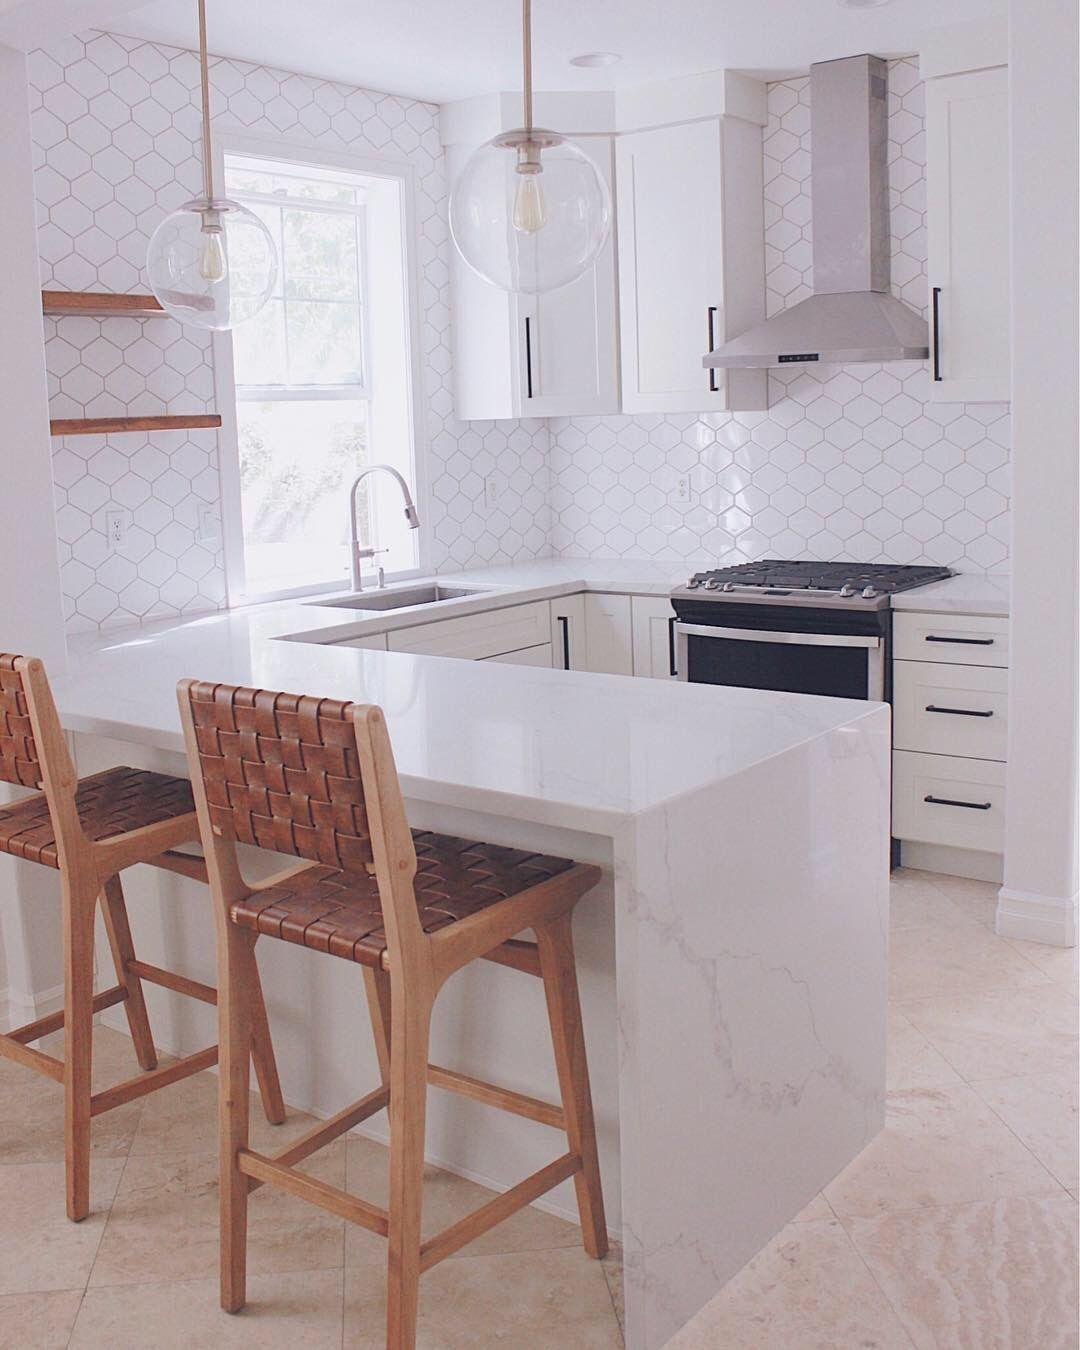 Modern White Kitchen with Matte Black Hardware, Floating